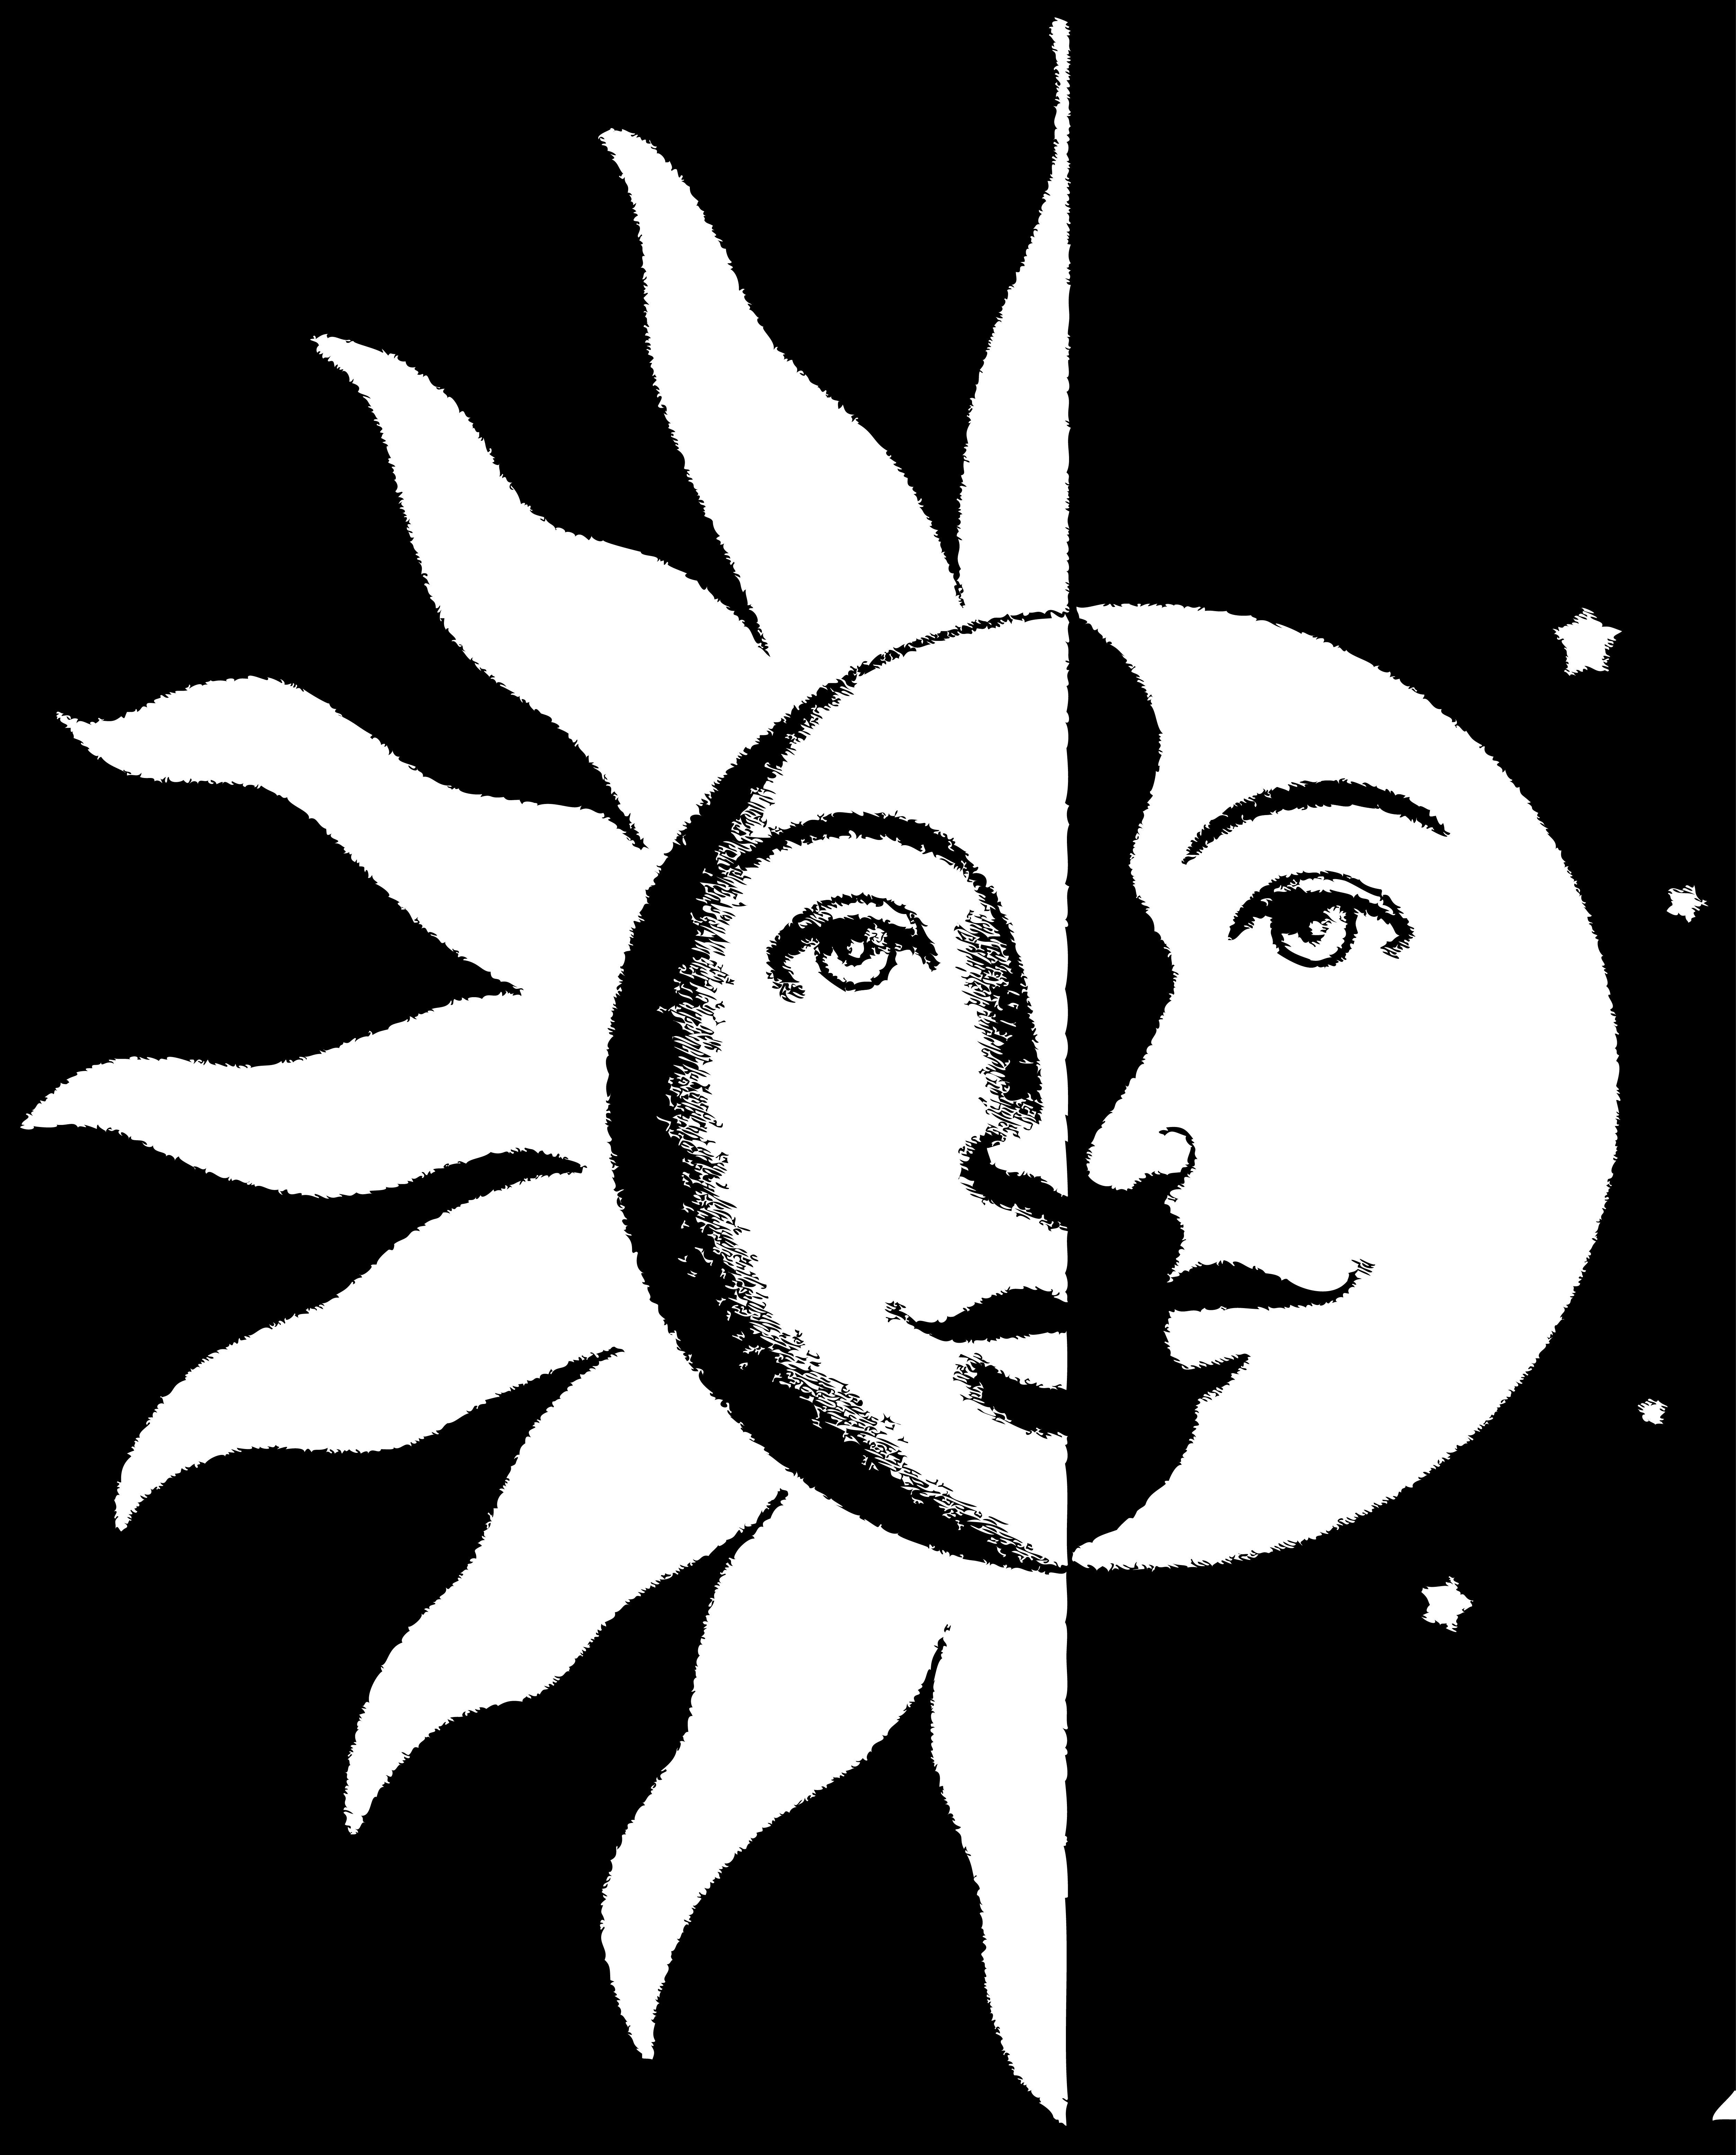 Bohemian Sun and Moon by tattoosbyashleigh on DeviantArt  |Sun And Moon Design Drawing